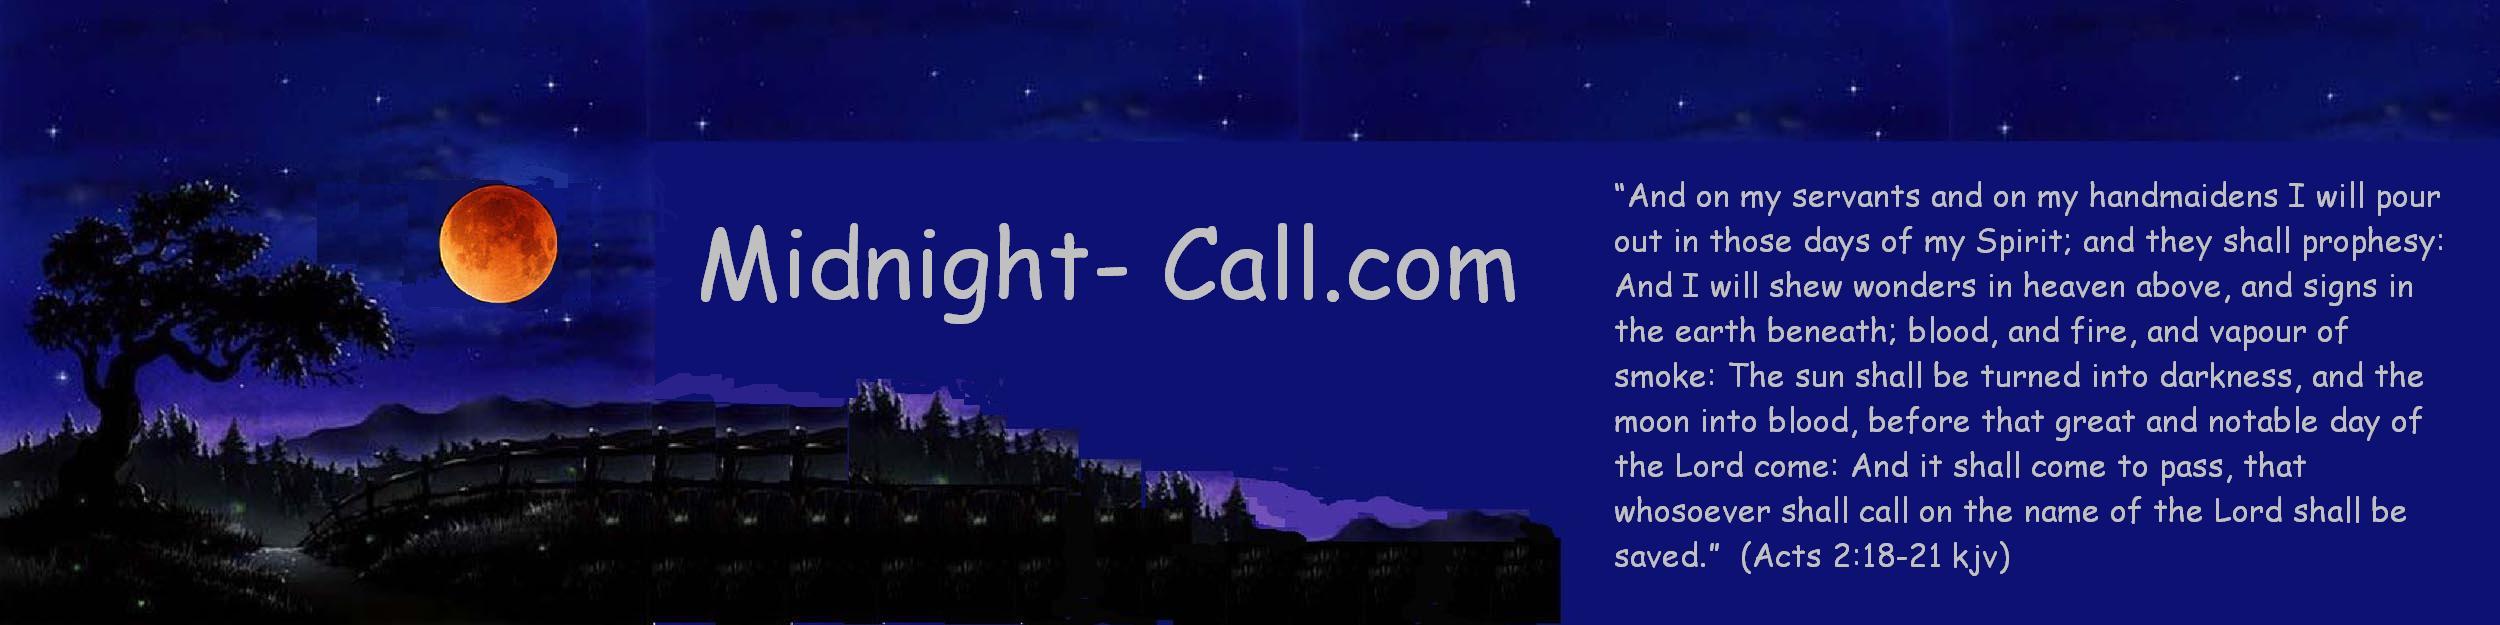 Midnight-Call.com